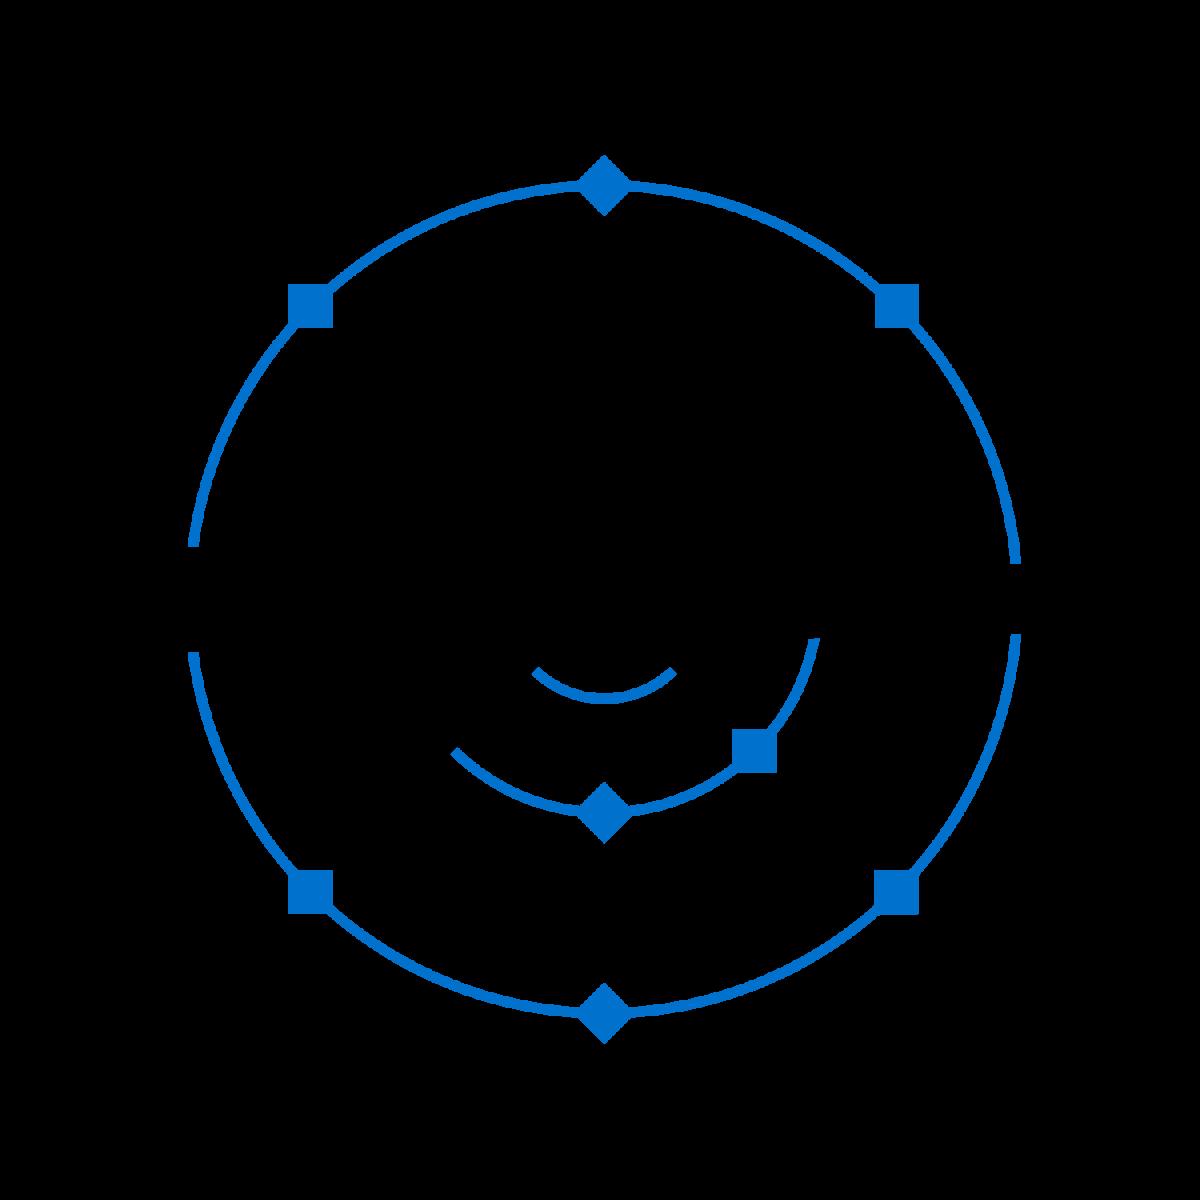 ECFA_Black&Blue_logo